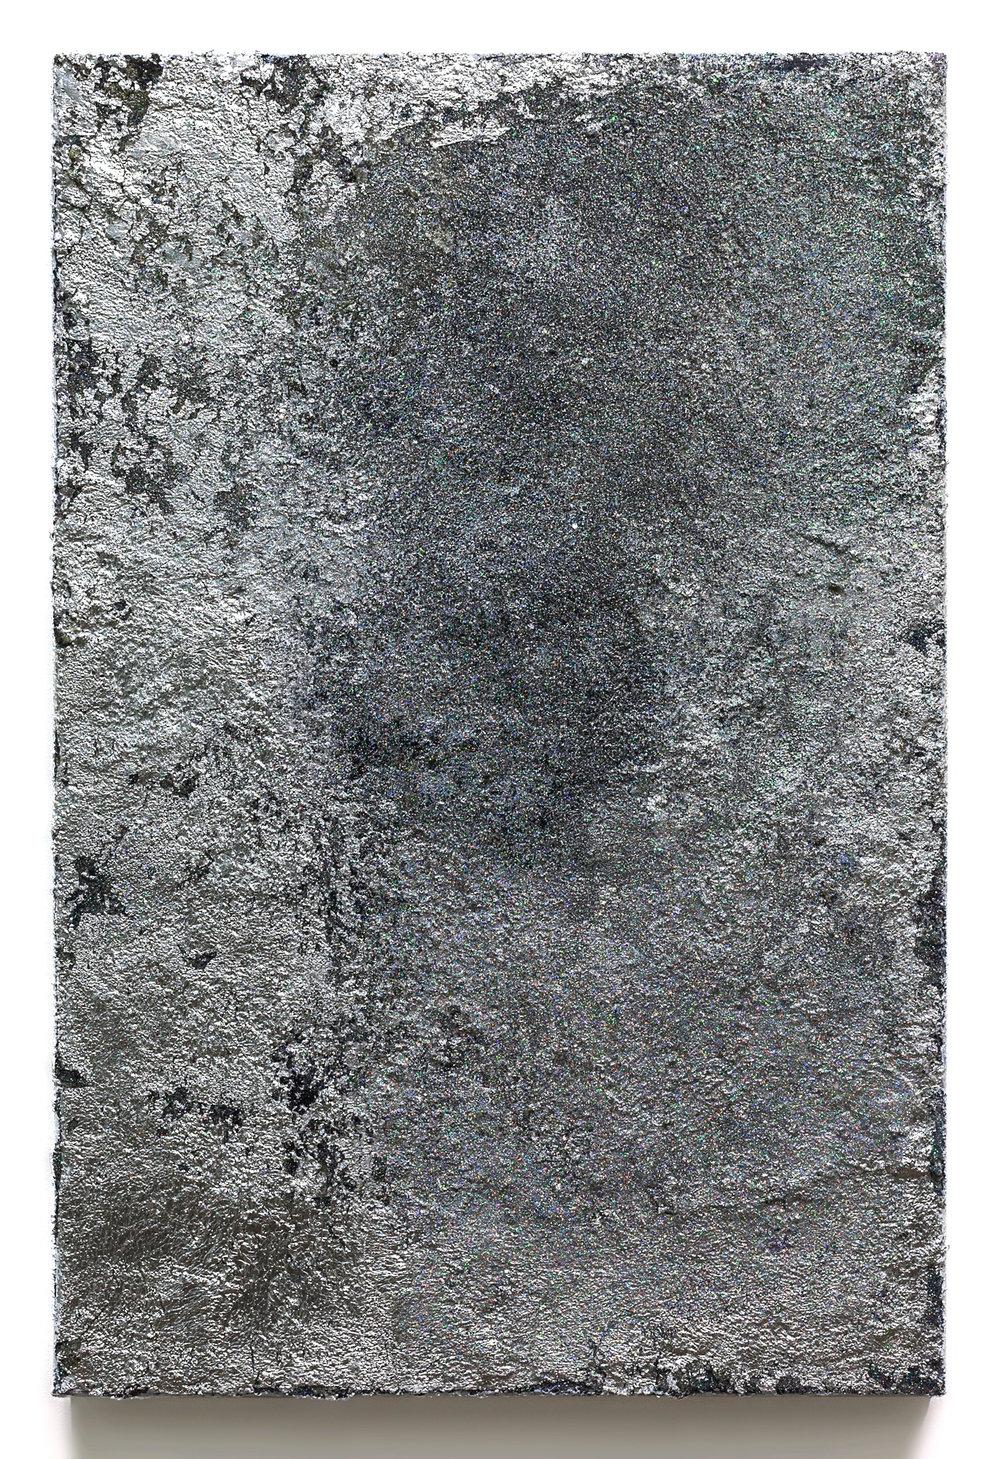 Rosalind Tallmadge  Artifact II  2017 Mixed media on canvas 26 x 18 inches